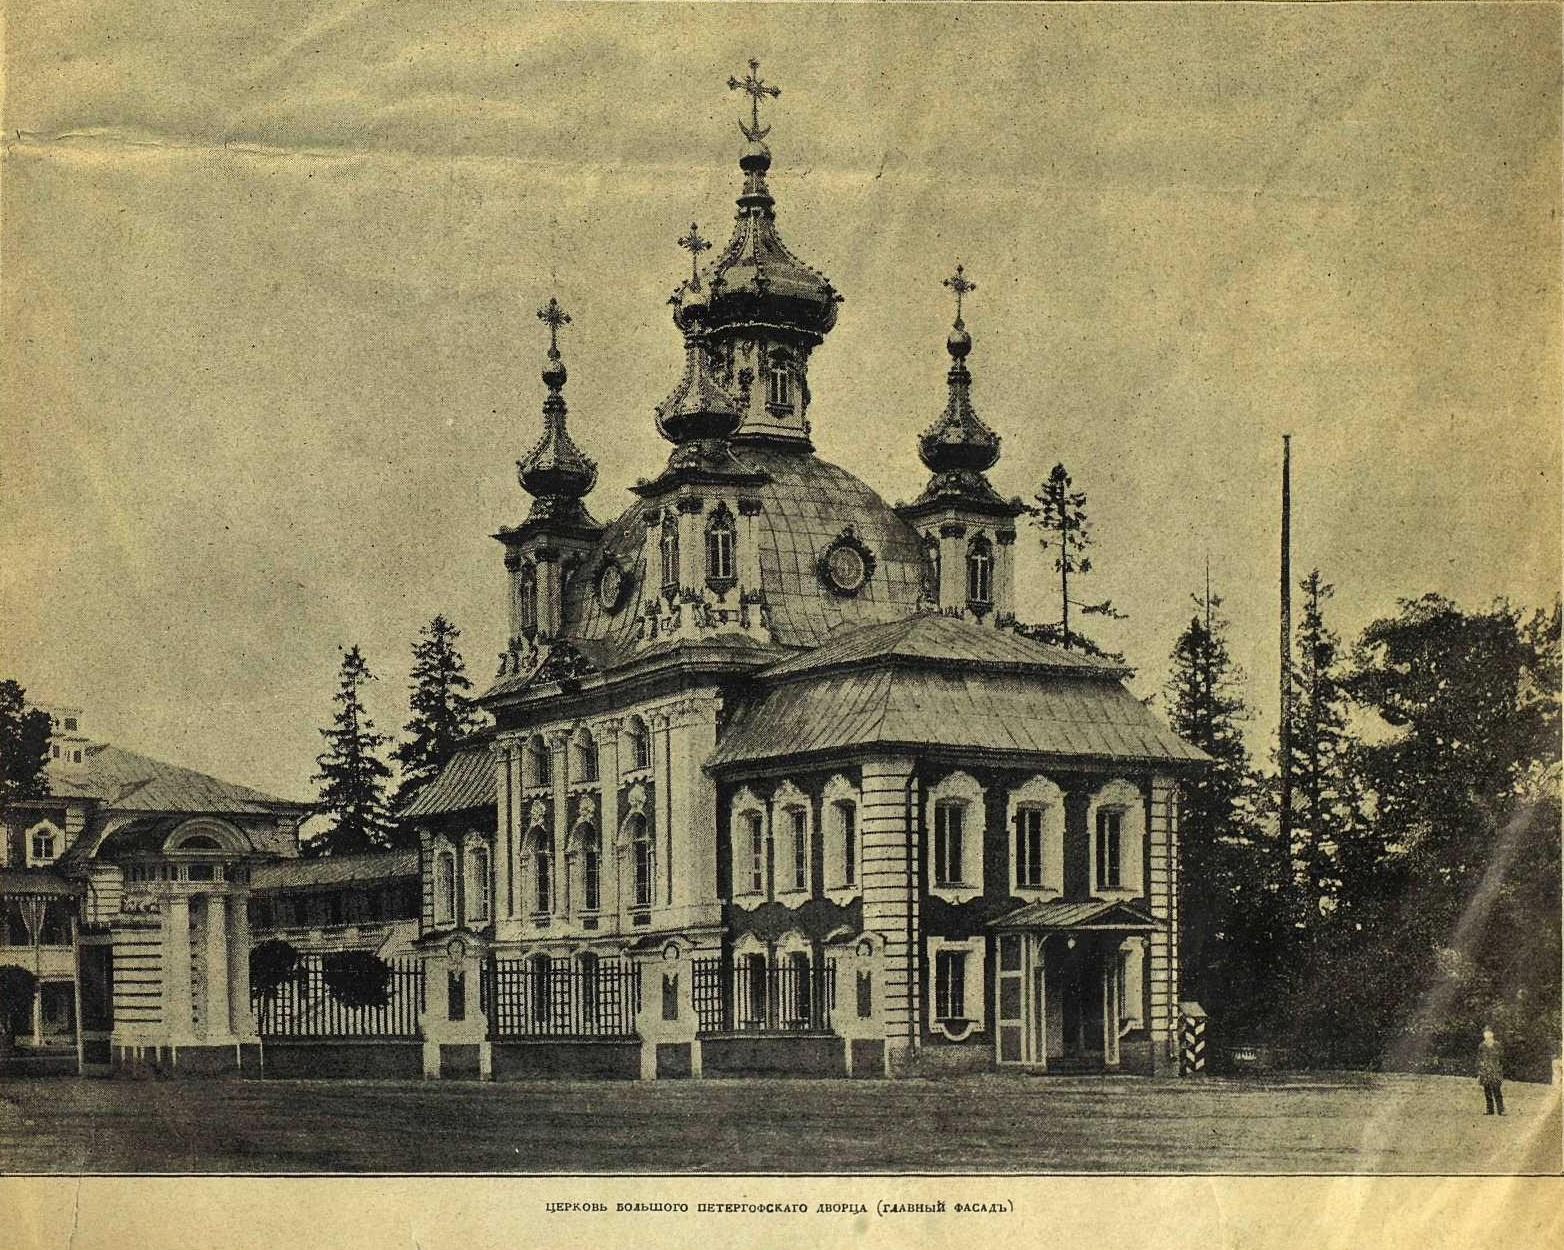 Церковь Большого дворца